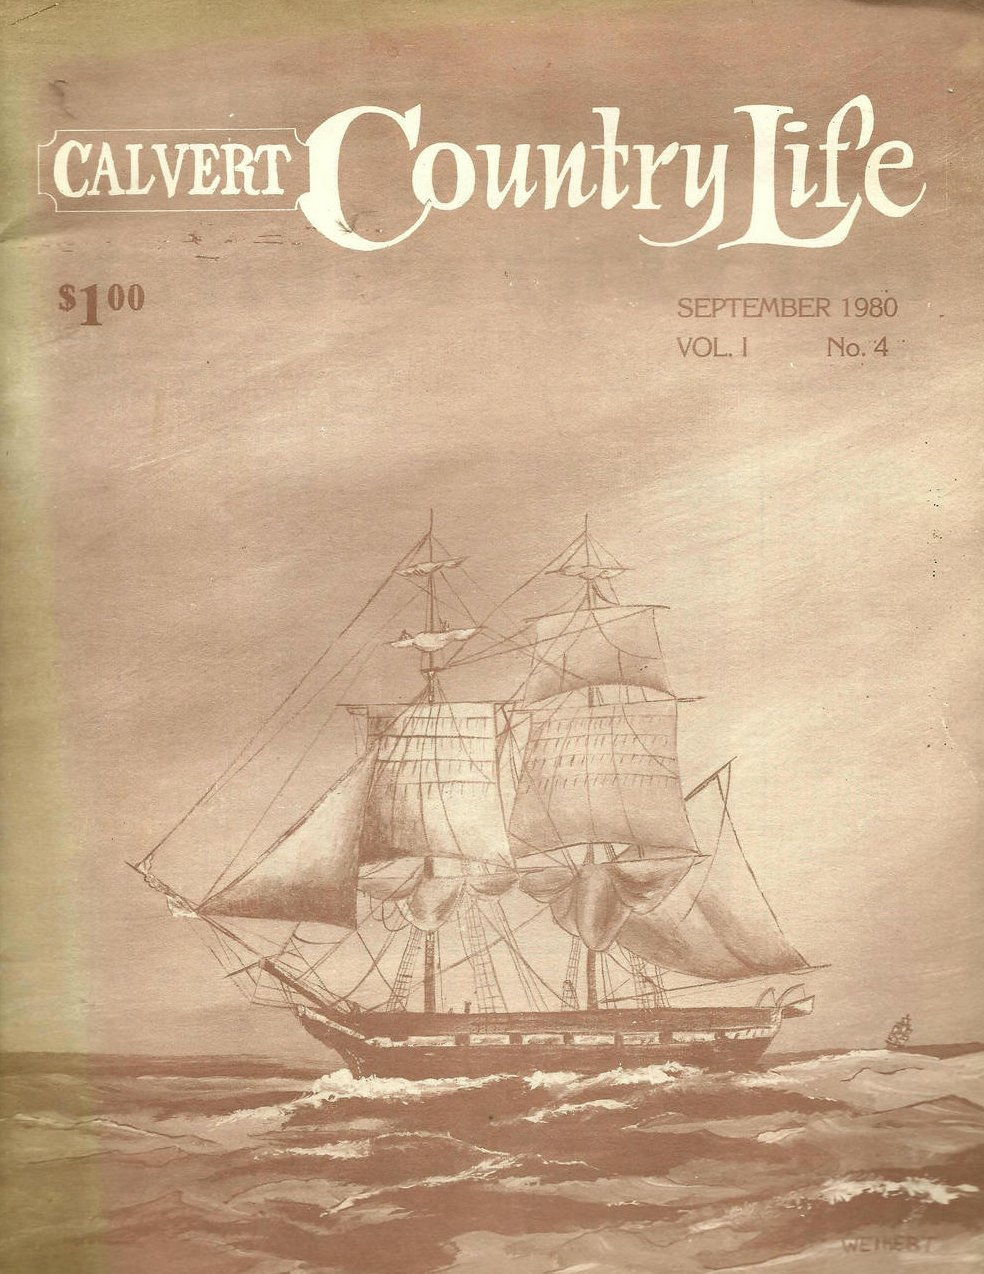 Calvert Country Life Vol 1 No 4 September 1980 Vintage Magazine